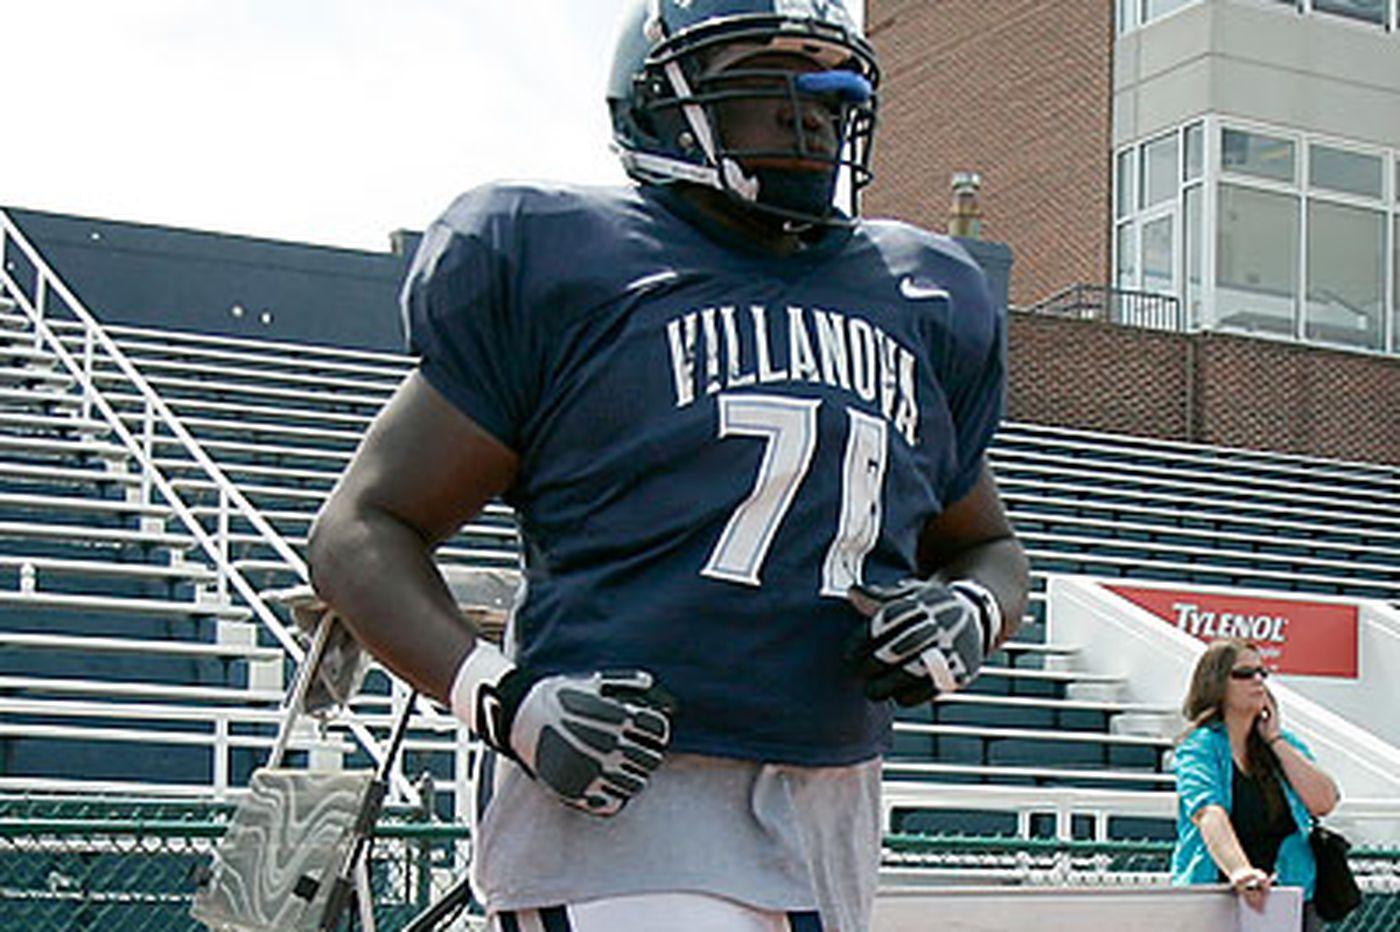 Villanova lineman Ijalana prominent on NFL radar